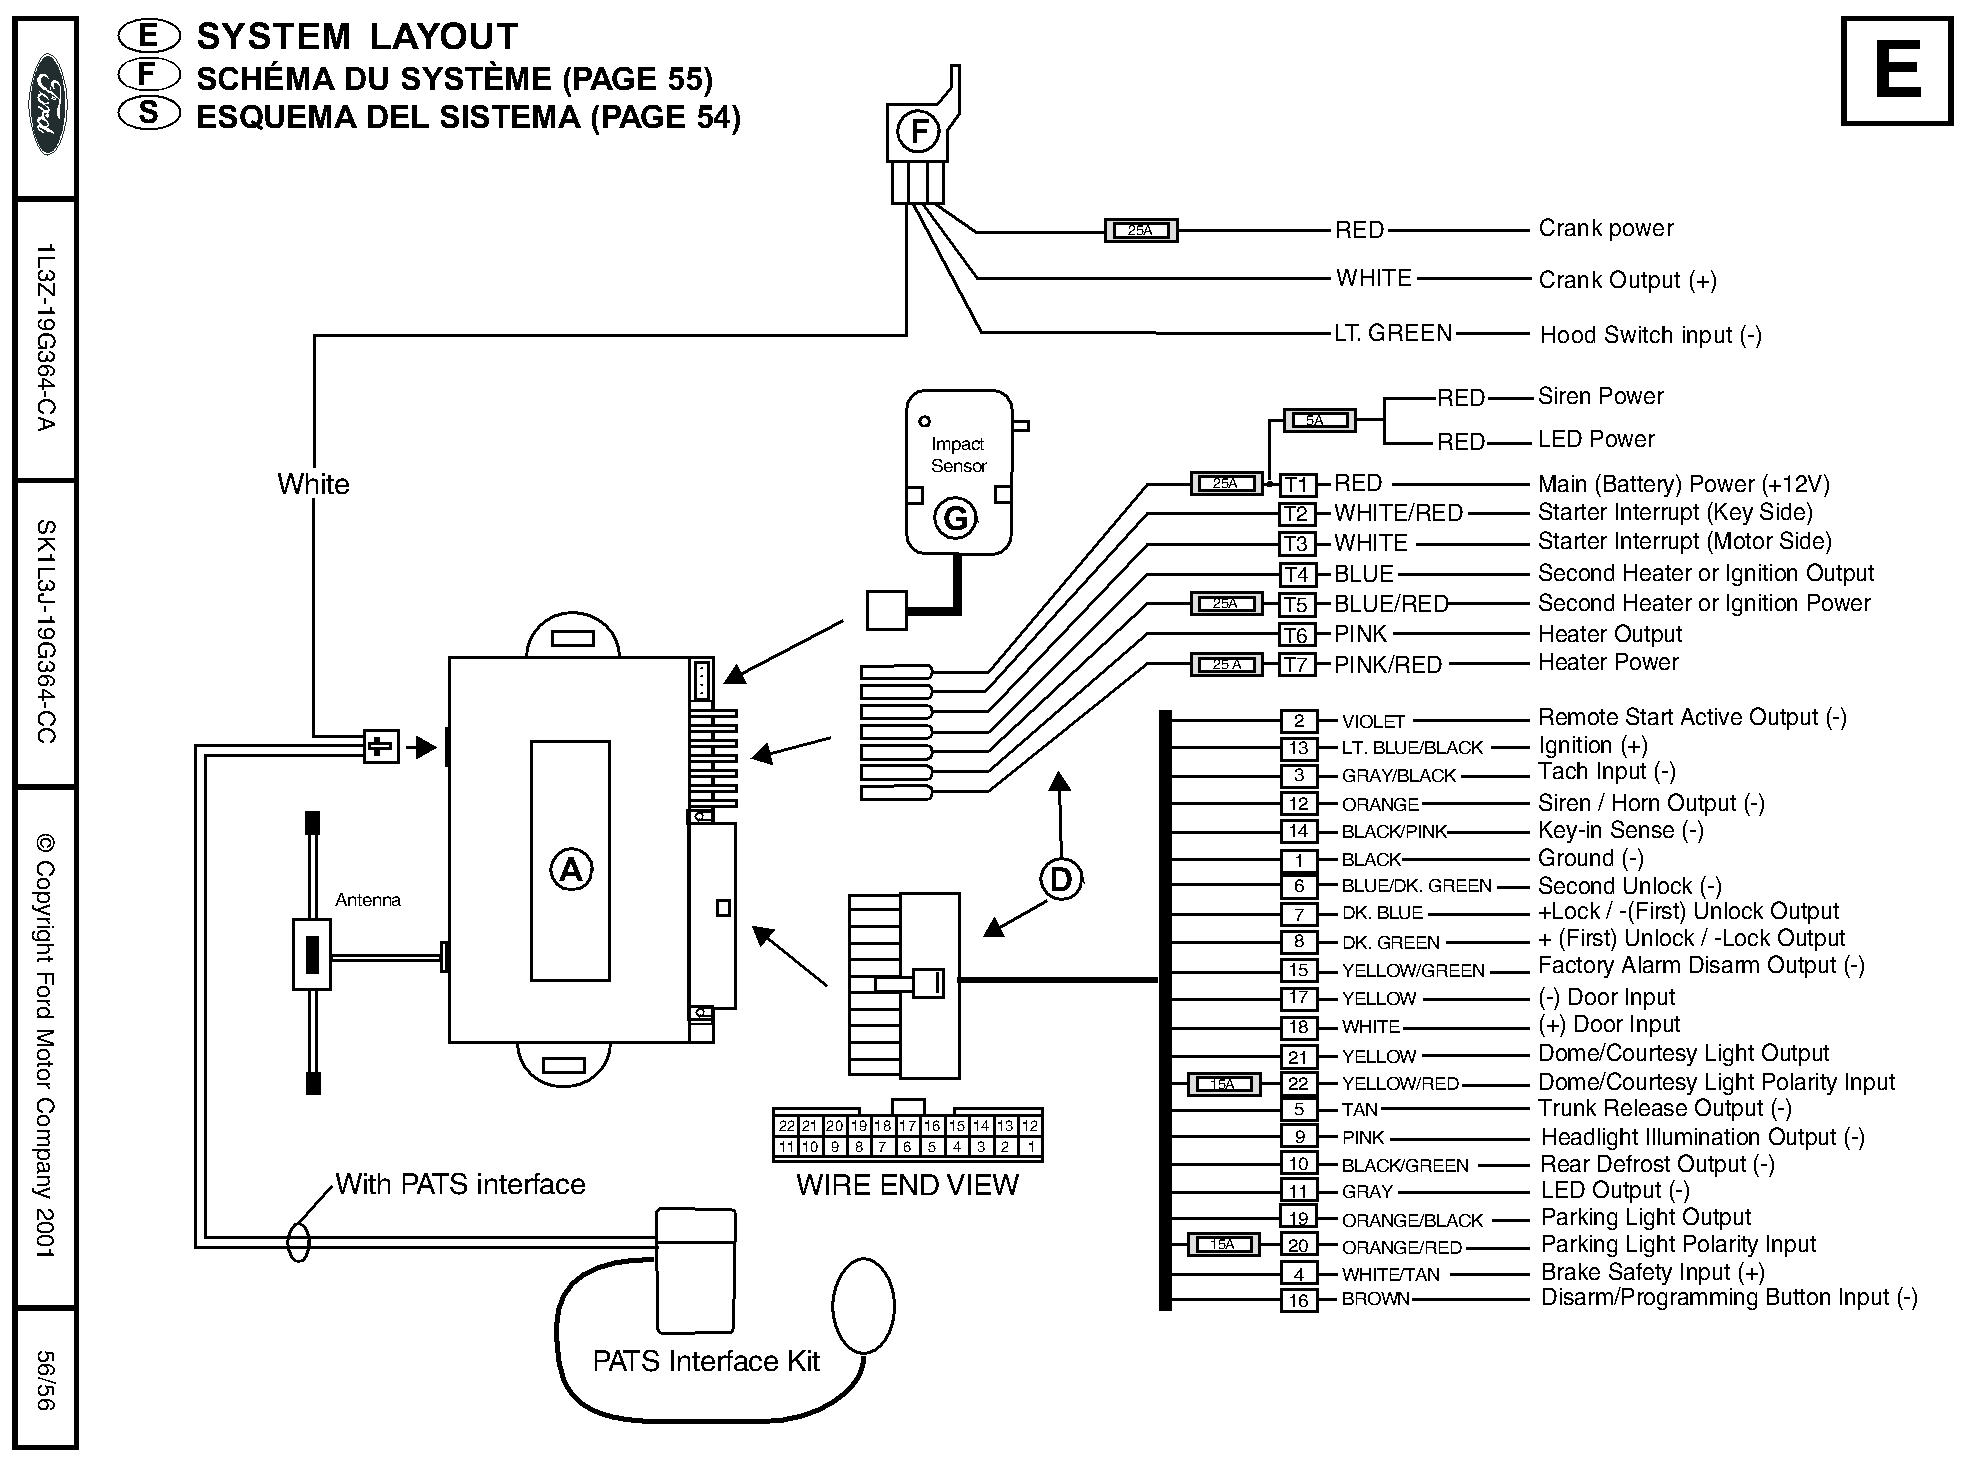 Auto Relay Wiring Diagram 2004 Escape Wiring Diagram Fordgoldstarter Auto  Relay Wiring Diagram 2004 Escapehtml